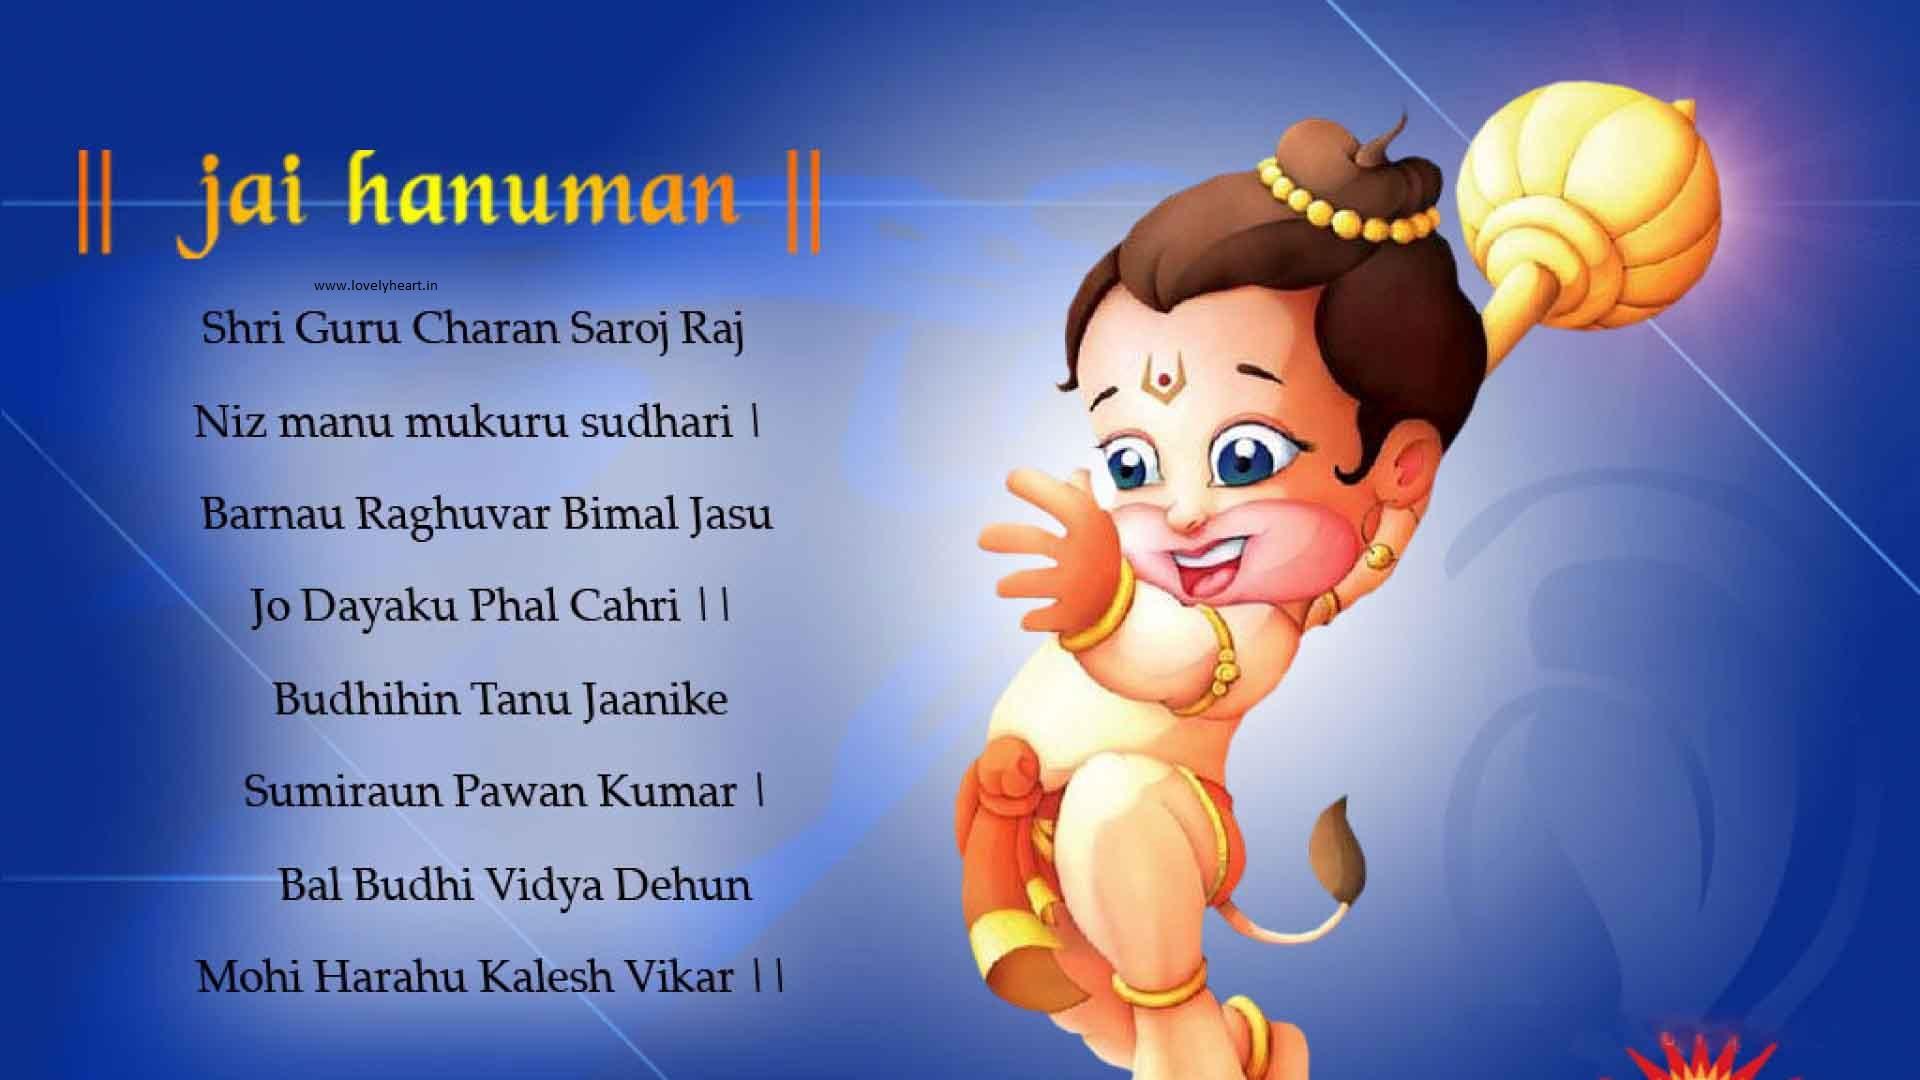 Hanuman Jayanti 2017 HD Picture